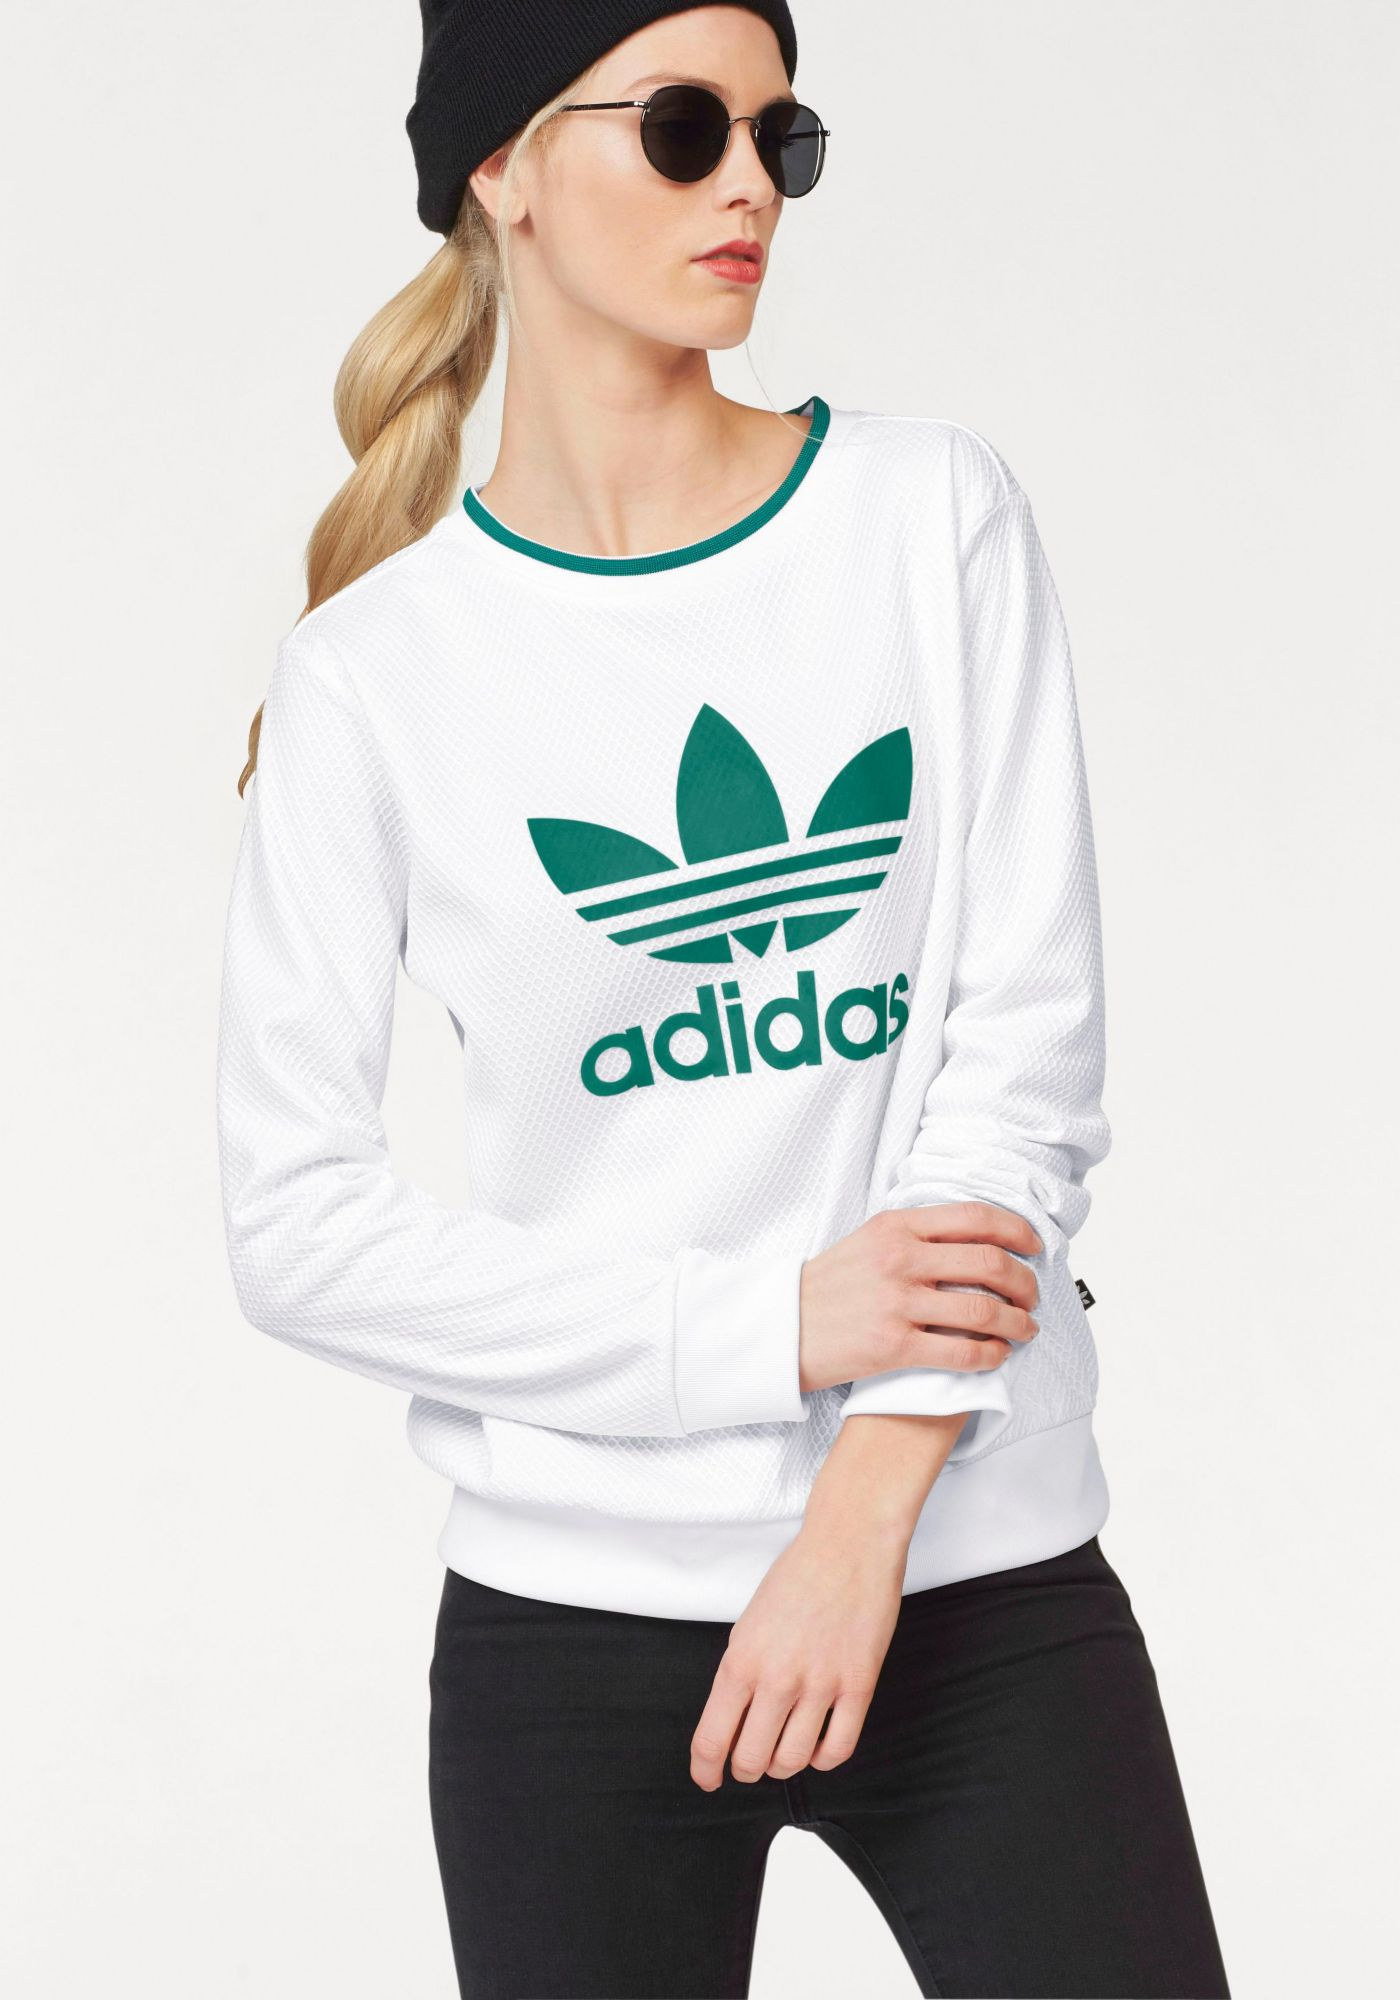 ADIDAS ORIGINALS adidas Originals Sweatshirt »ADIDAS EQT LOGO SWEATER«